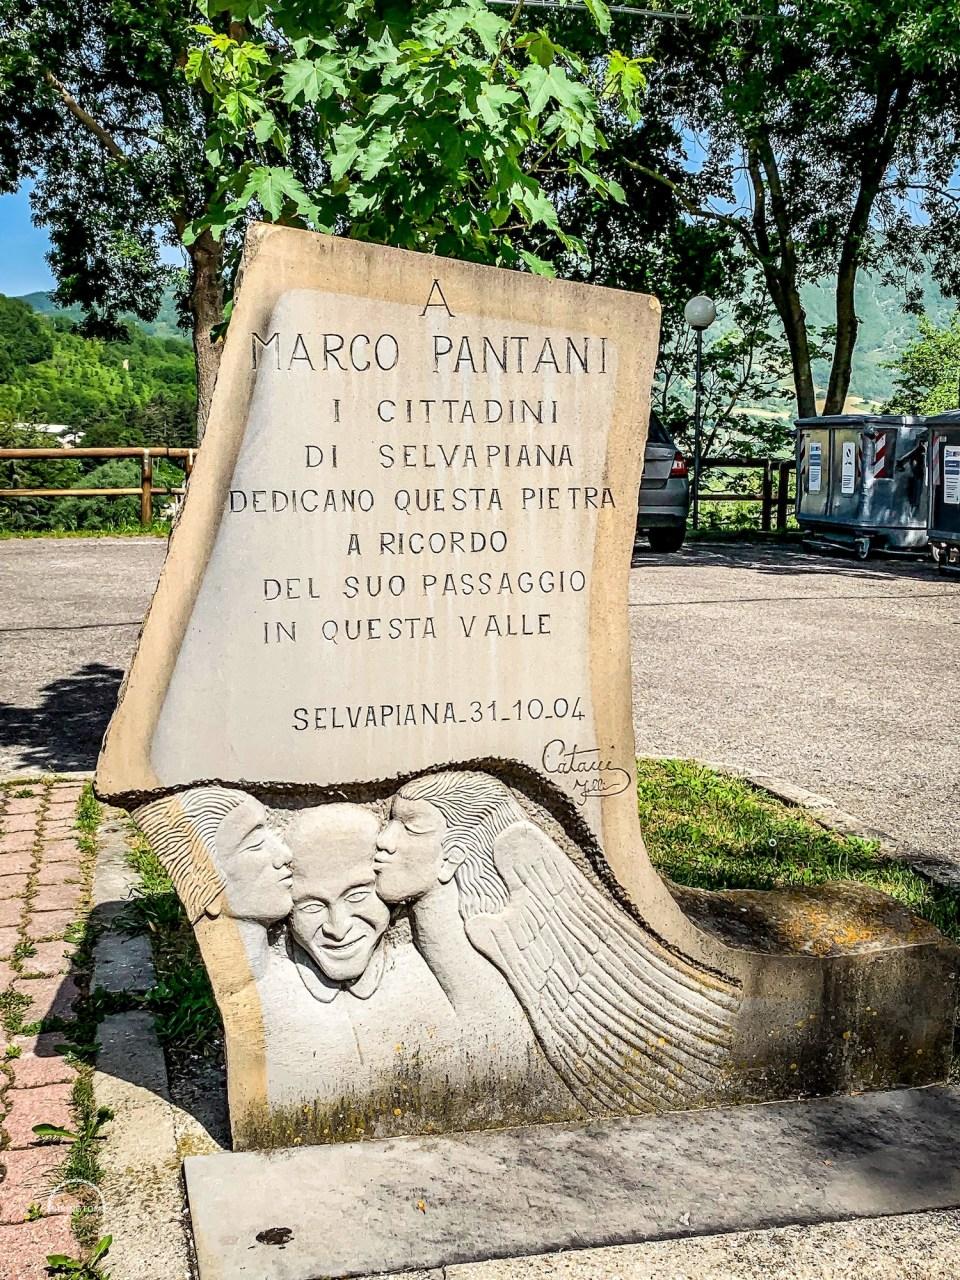 Emilia Romagna,Cycling,Fahrrad,Italien,bikingtom,Marco Pantani